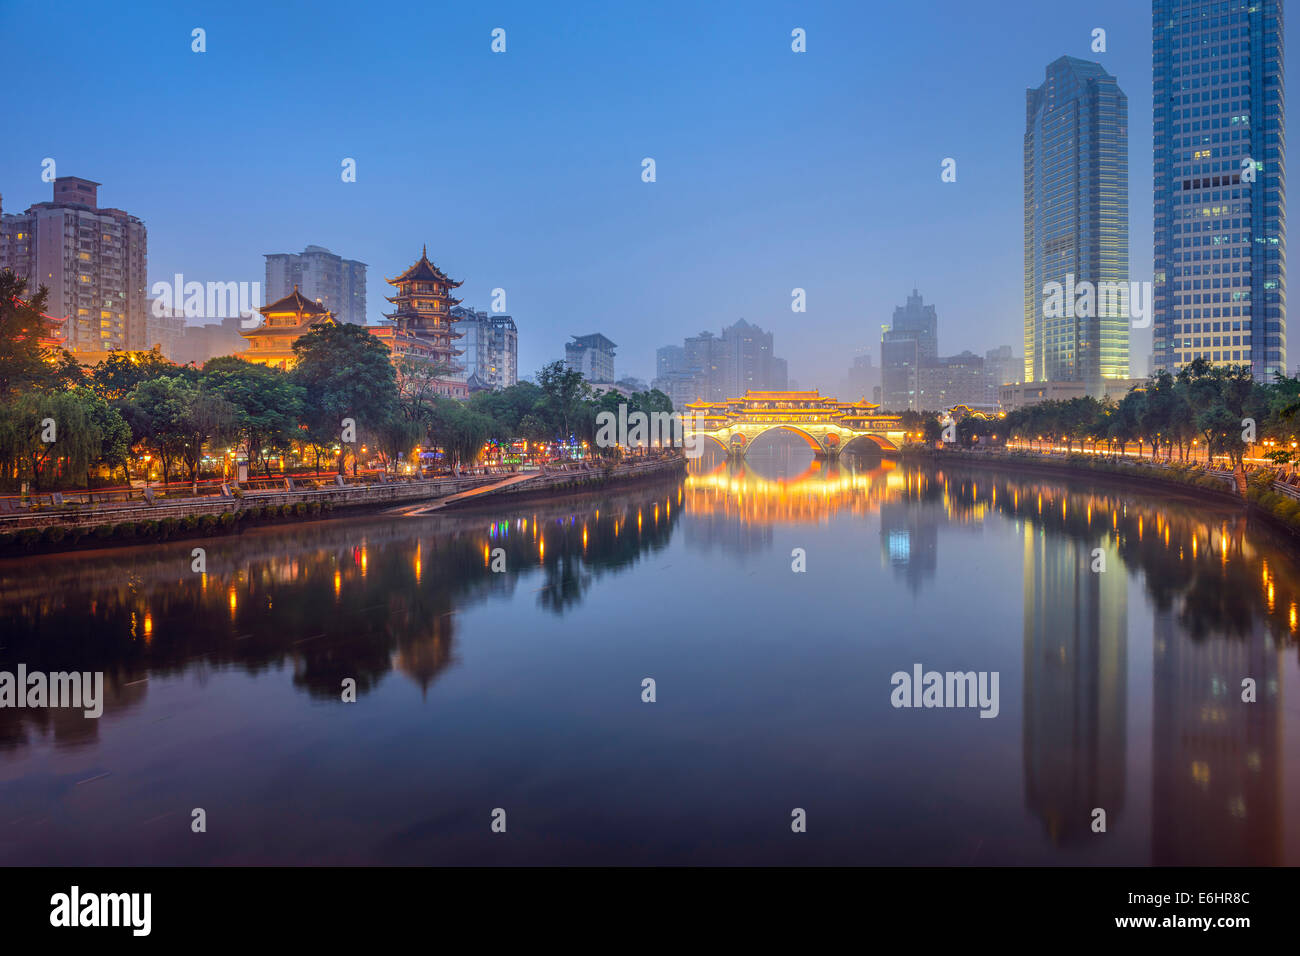 Chengdu, Sichuan, China at Anshun Bridge. - Stock Image